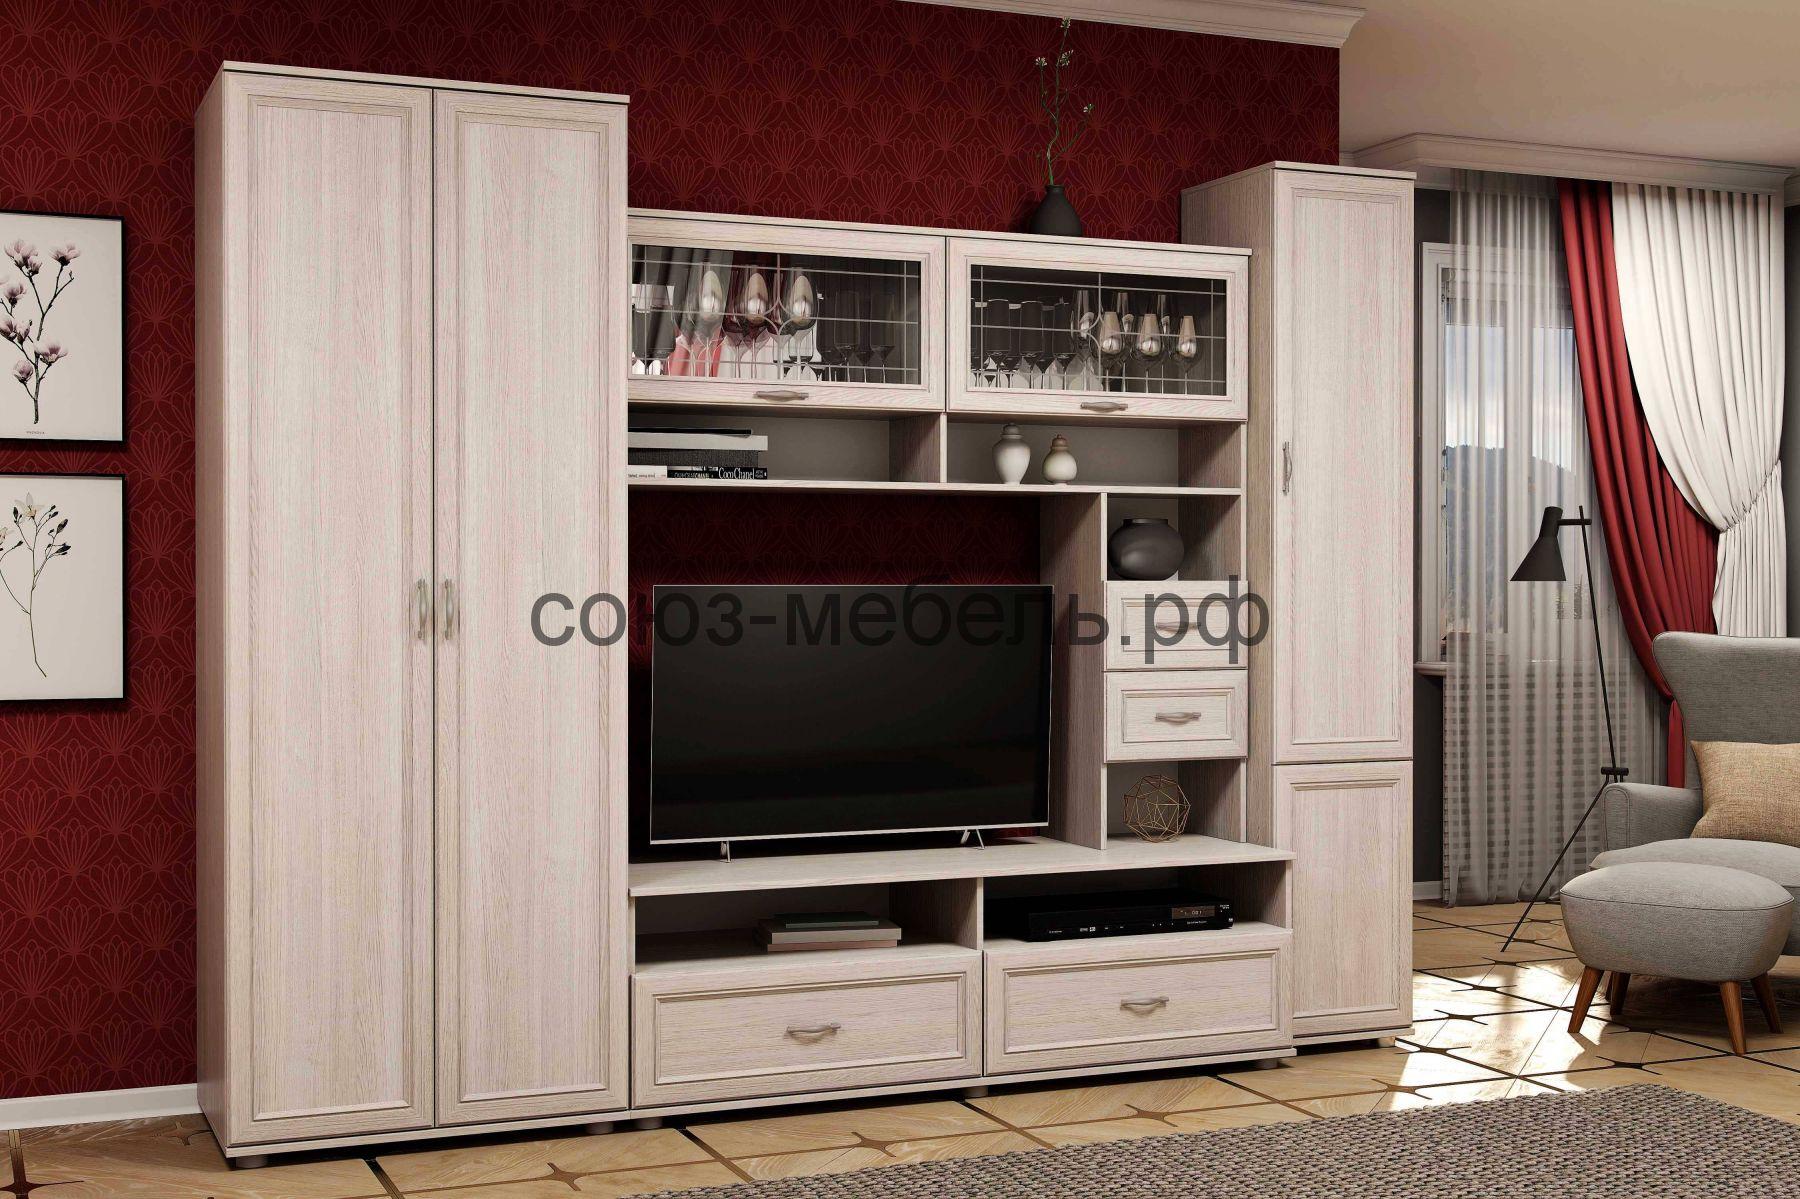 Гостиная КЛАССИКА (шкаф ШУ+витрина ШМ-4+пенал ПС)